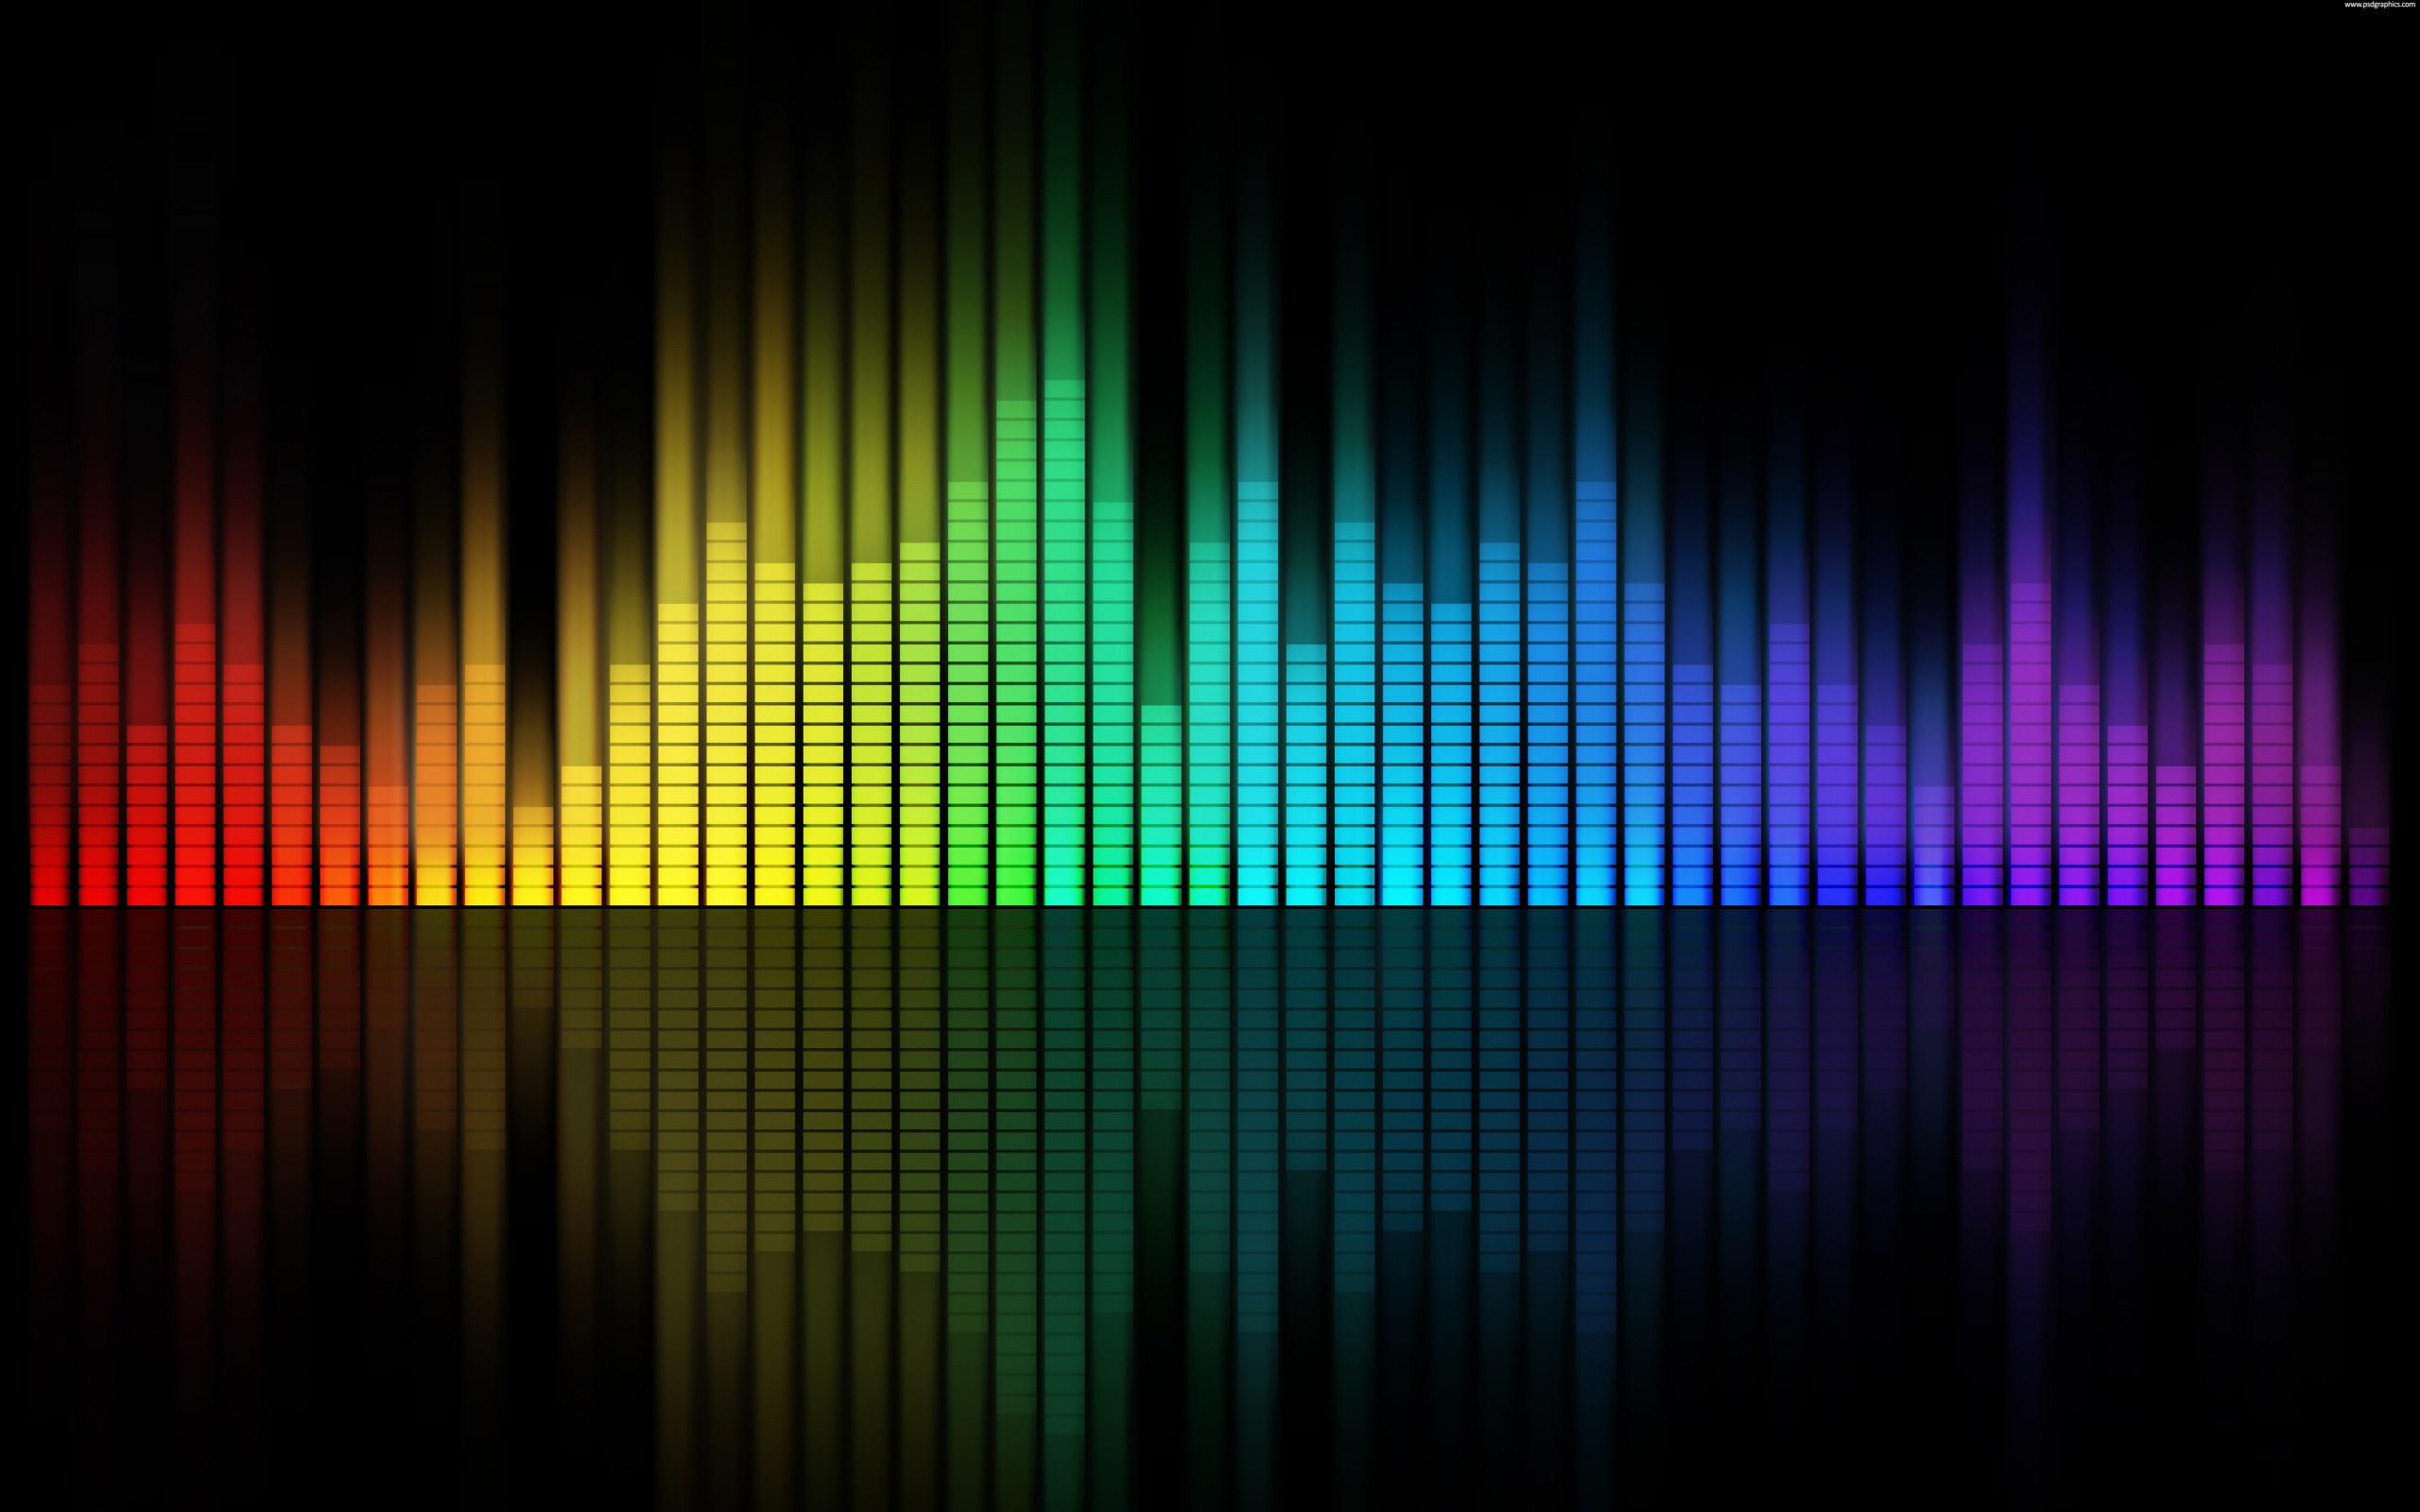 Music Smartphone Hd Wallpapers Hd Wallpaper 2560x1600